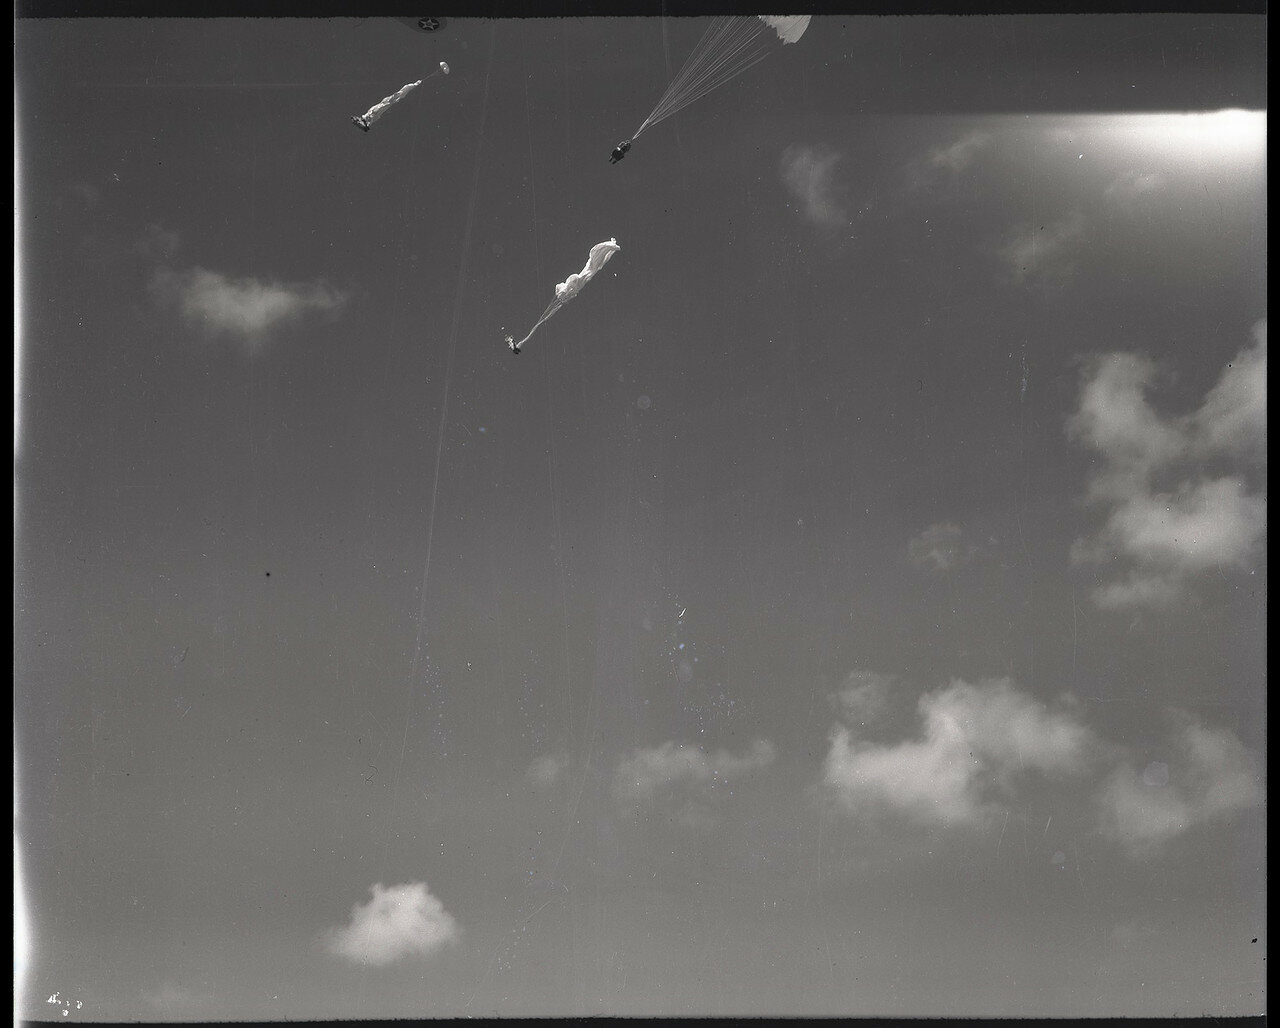 04. Сброшены манекены на парашютах